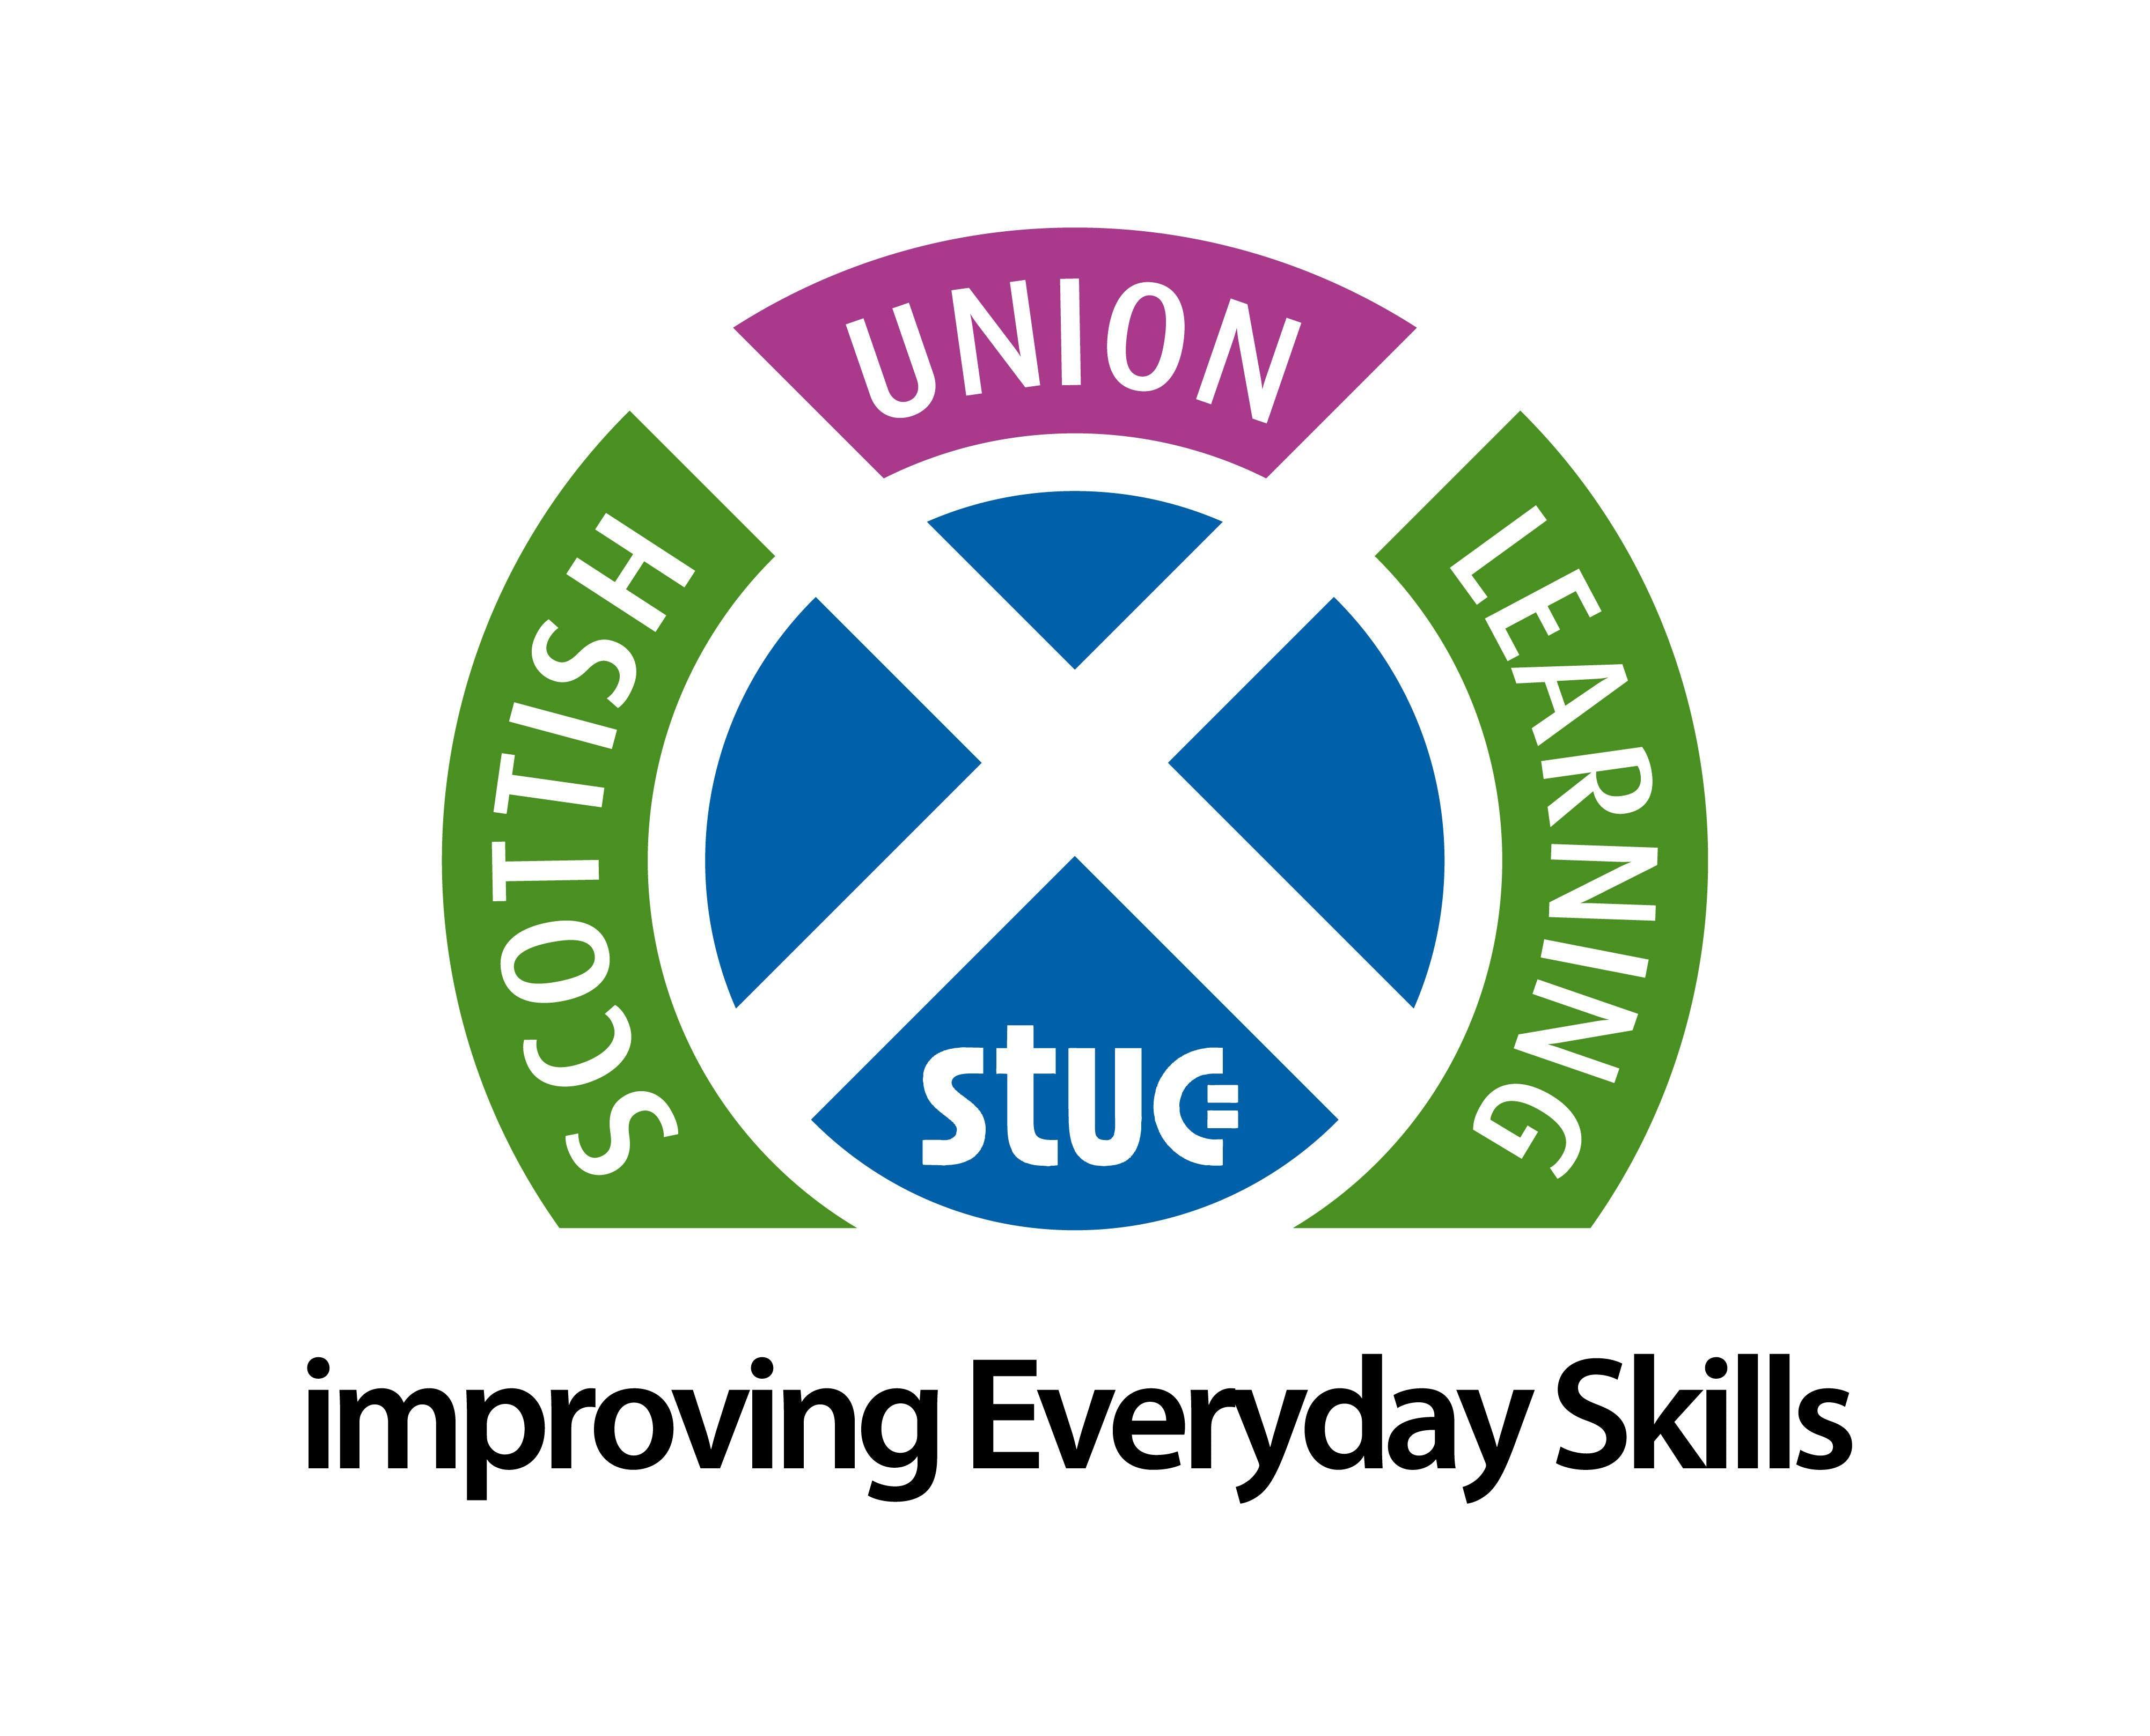 Scottish Union Learning Conference 2019